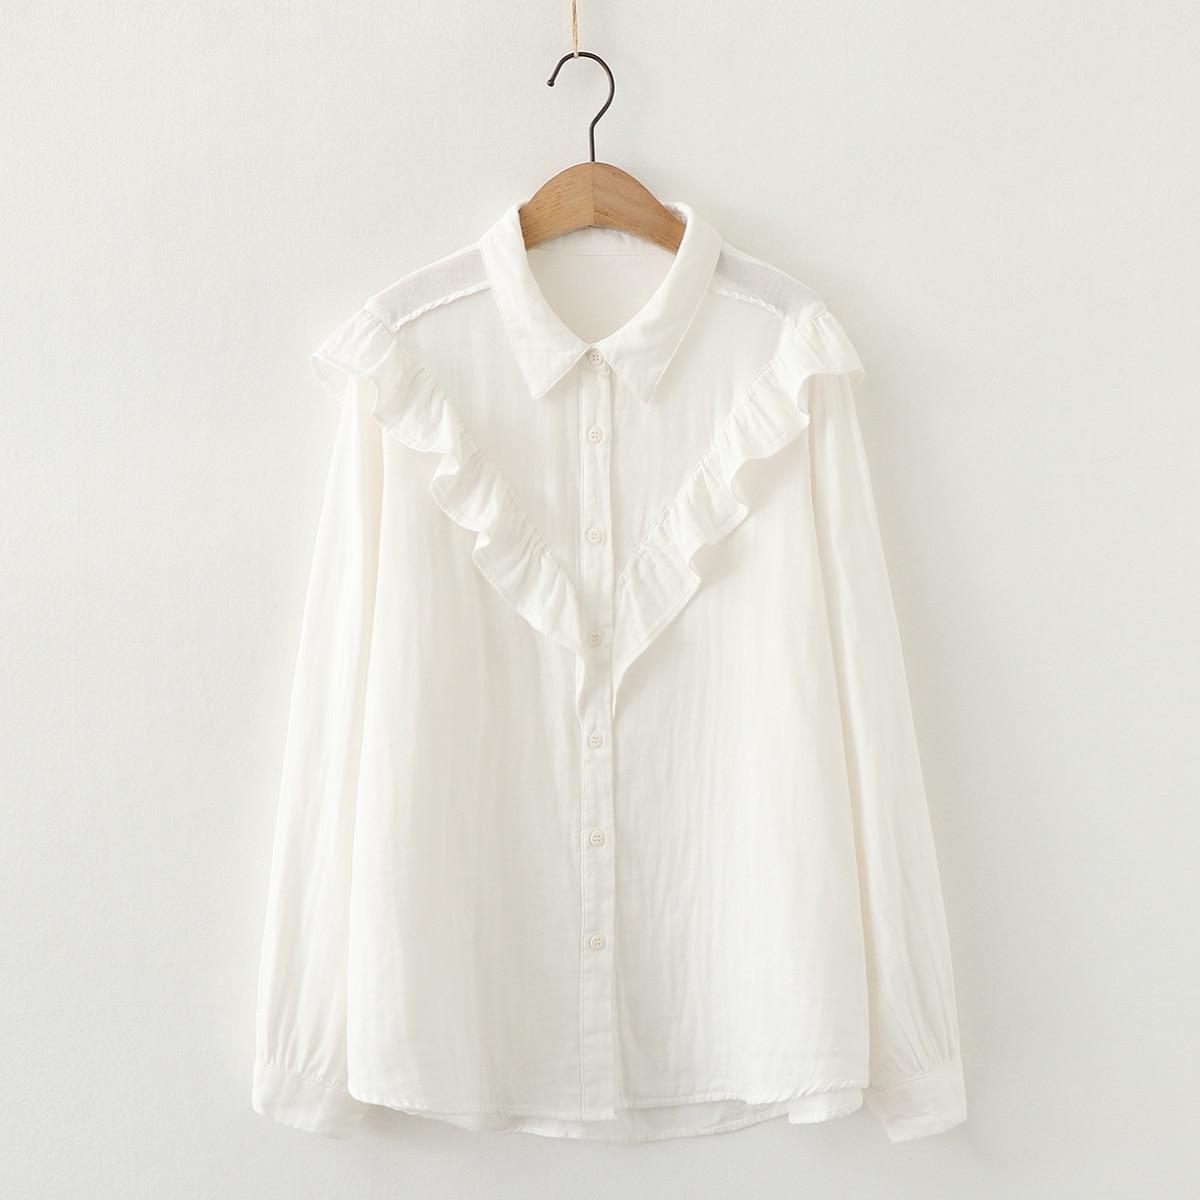 V shape ruffles white cotton yarn long sleeve shirt women blouse